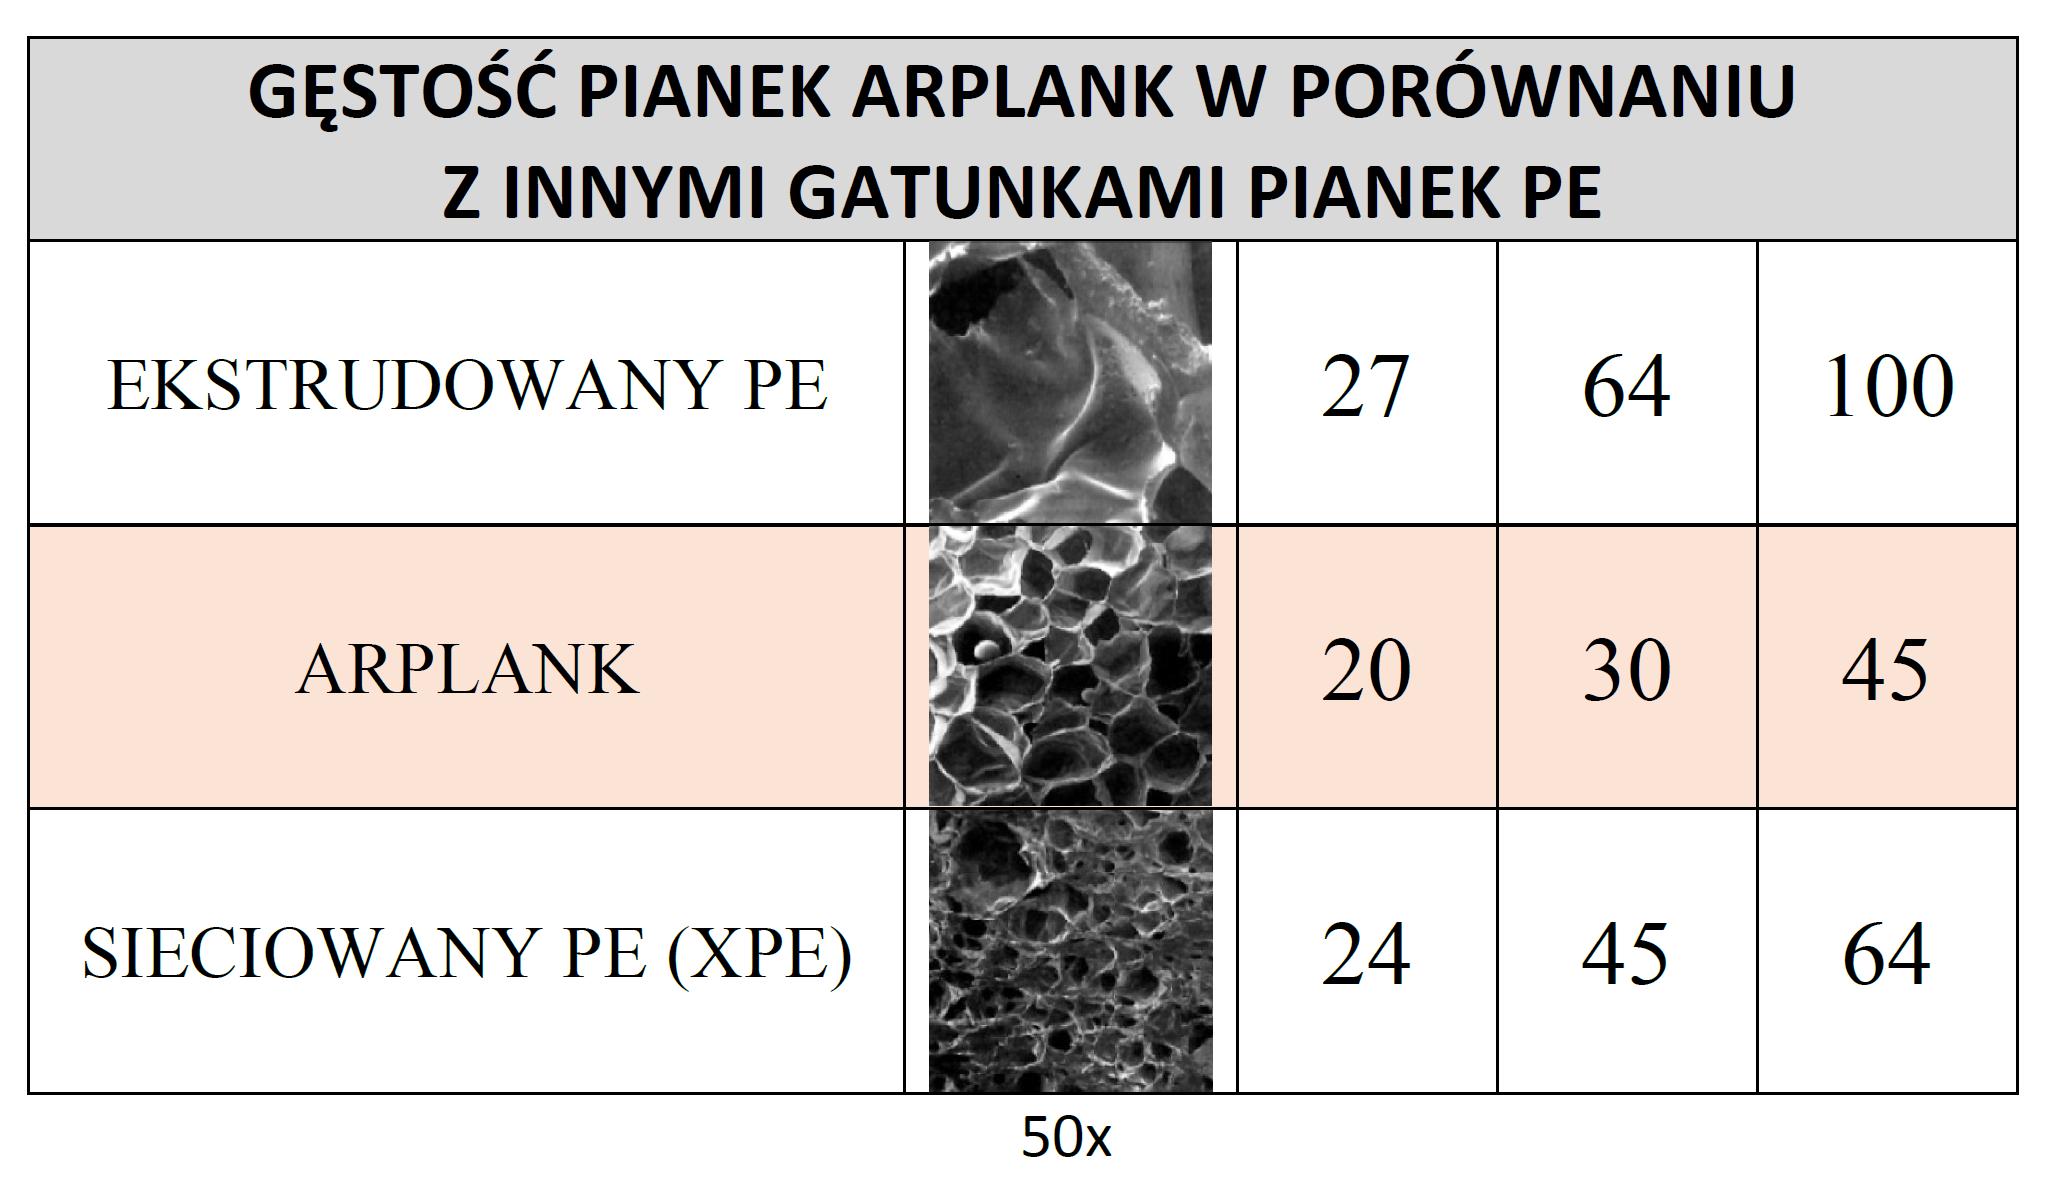 ARPLANK-GESTOSC